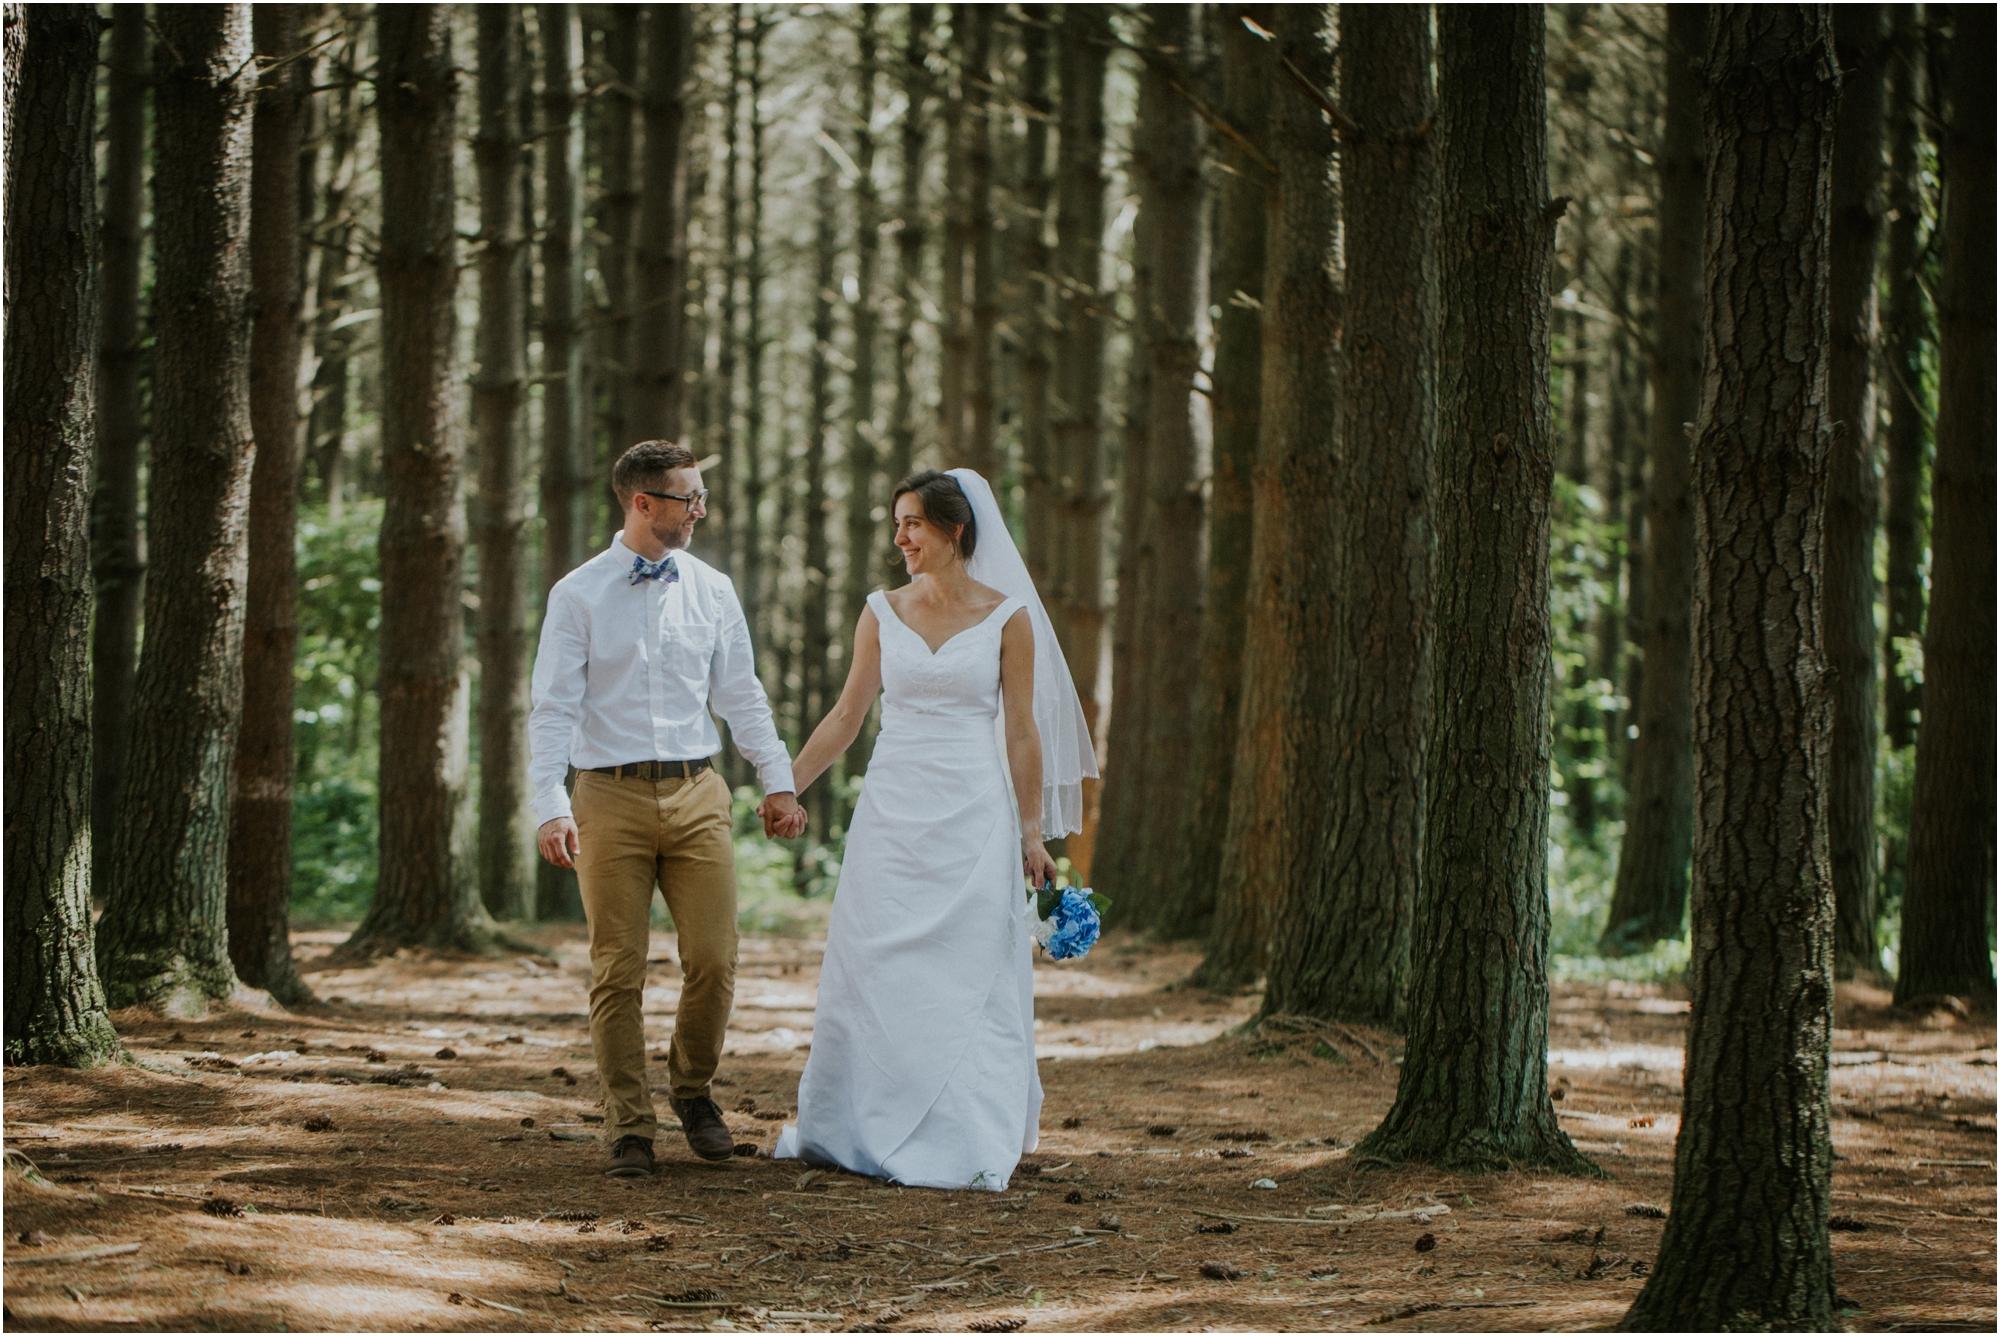 sugar-hollow-park-bristol-virginia-wedding-intimate-woodsy-black-forest-ceremony-adventurous-couple_0078.jpg